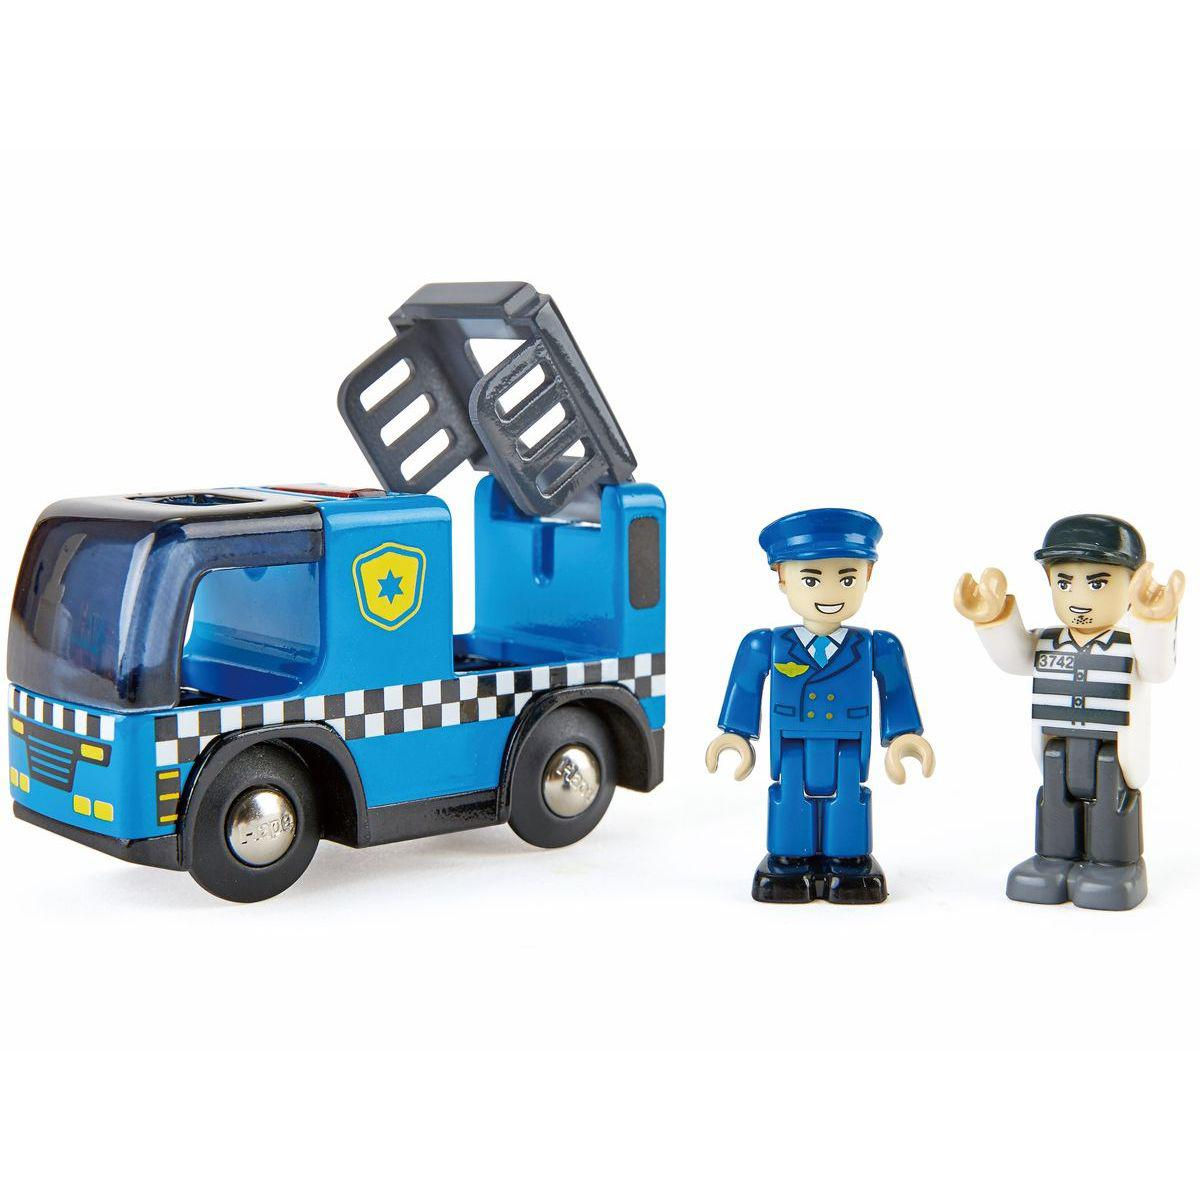 Voiture de police avec sirène POLICE CAR Hape